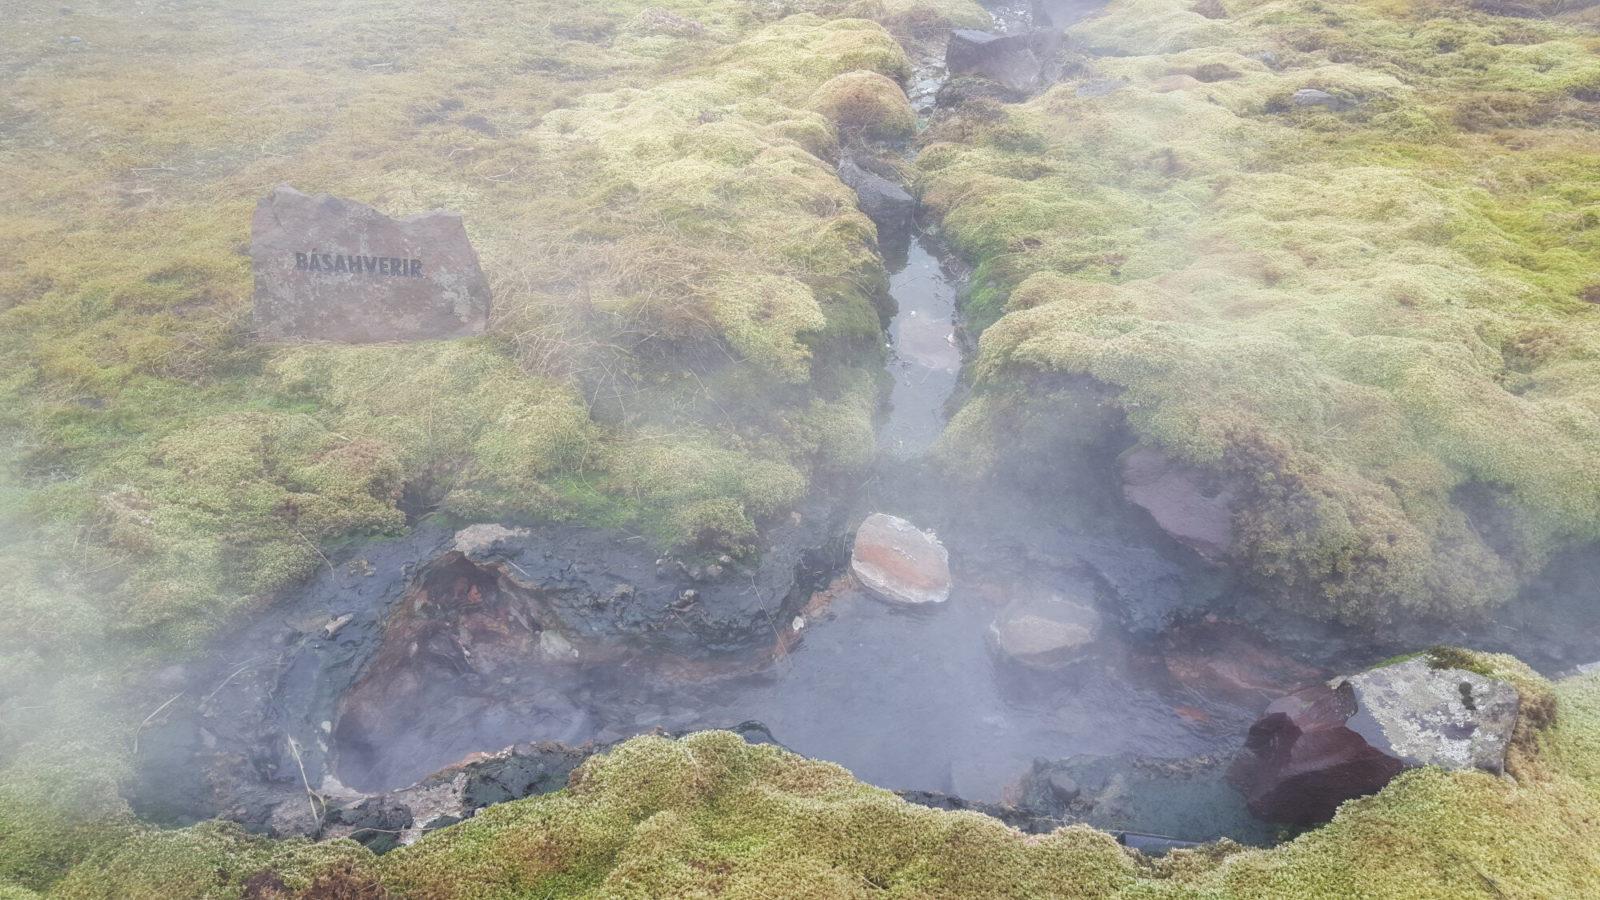 Hot spring at the secret lagoon.